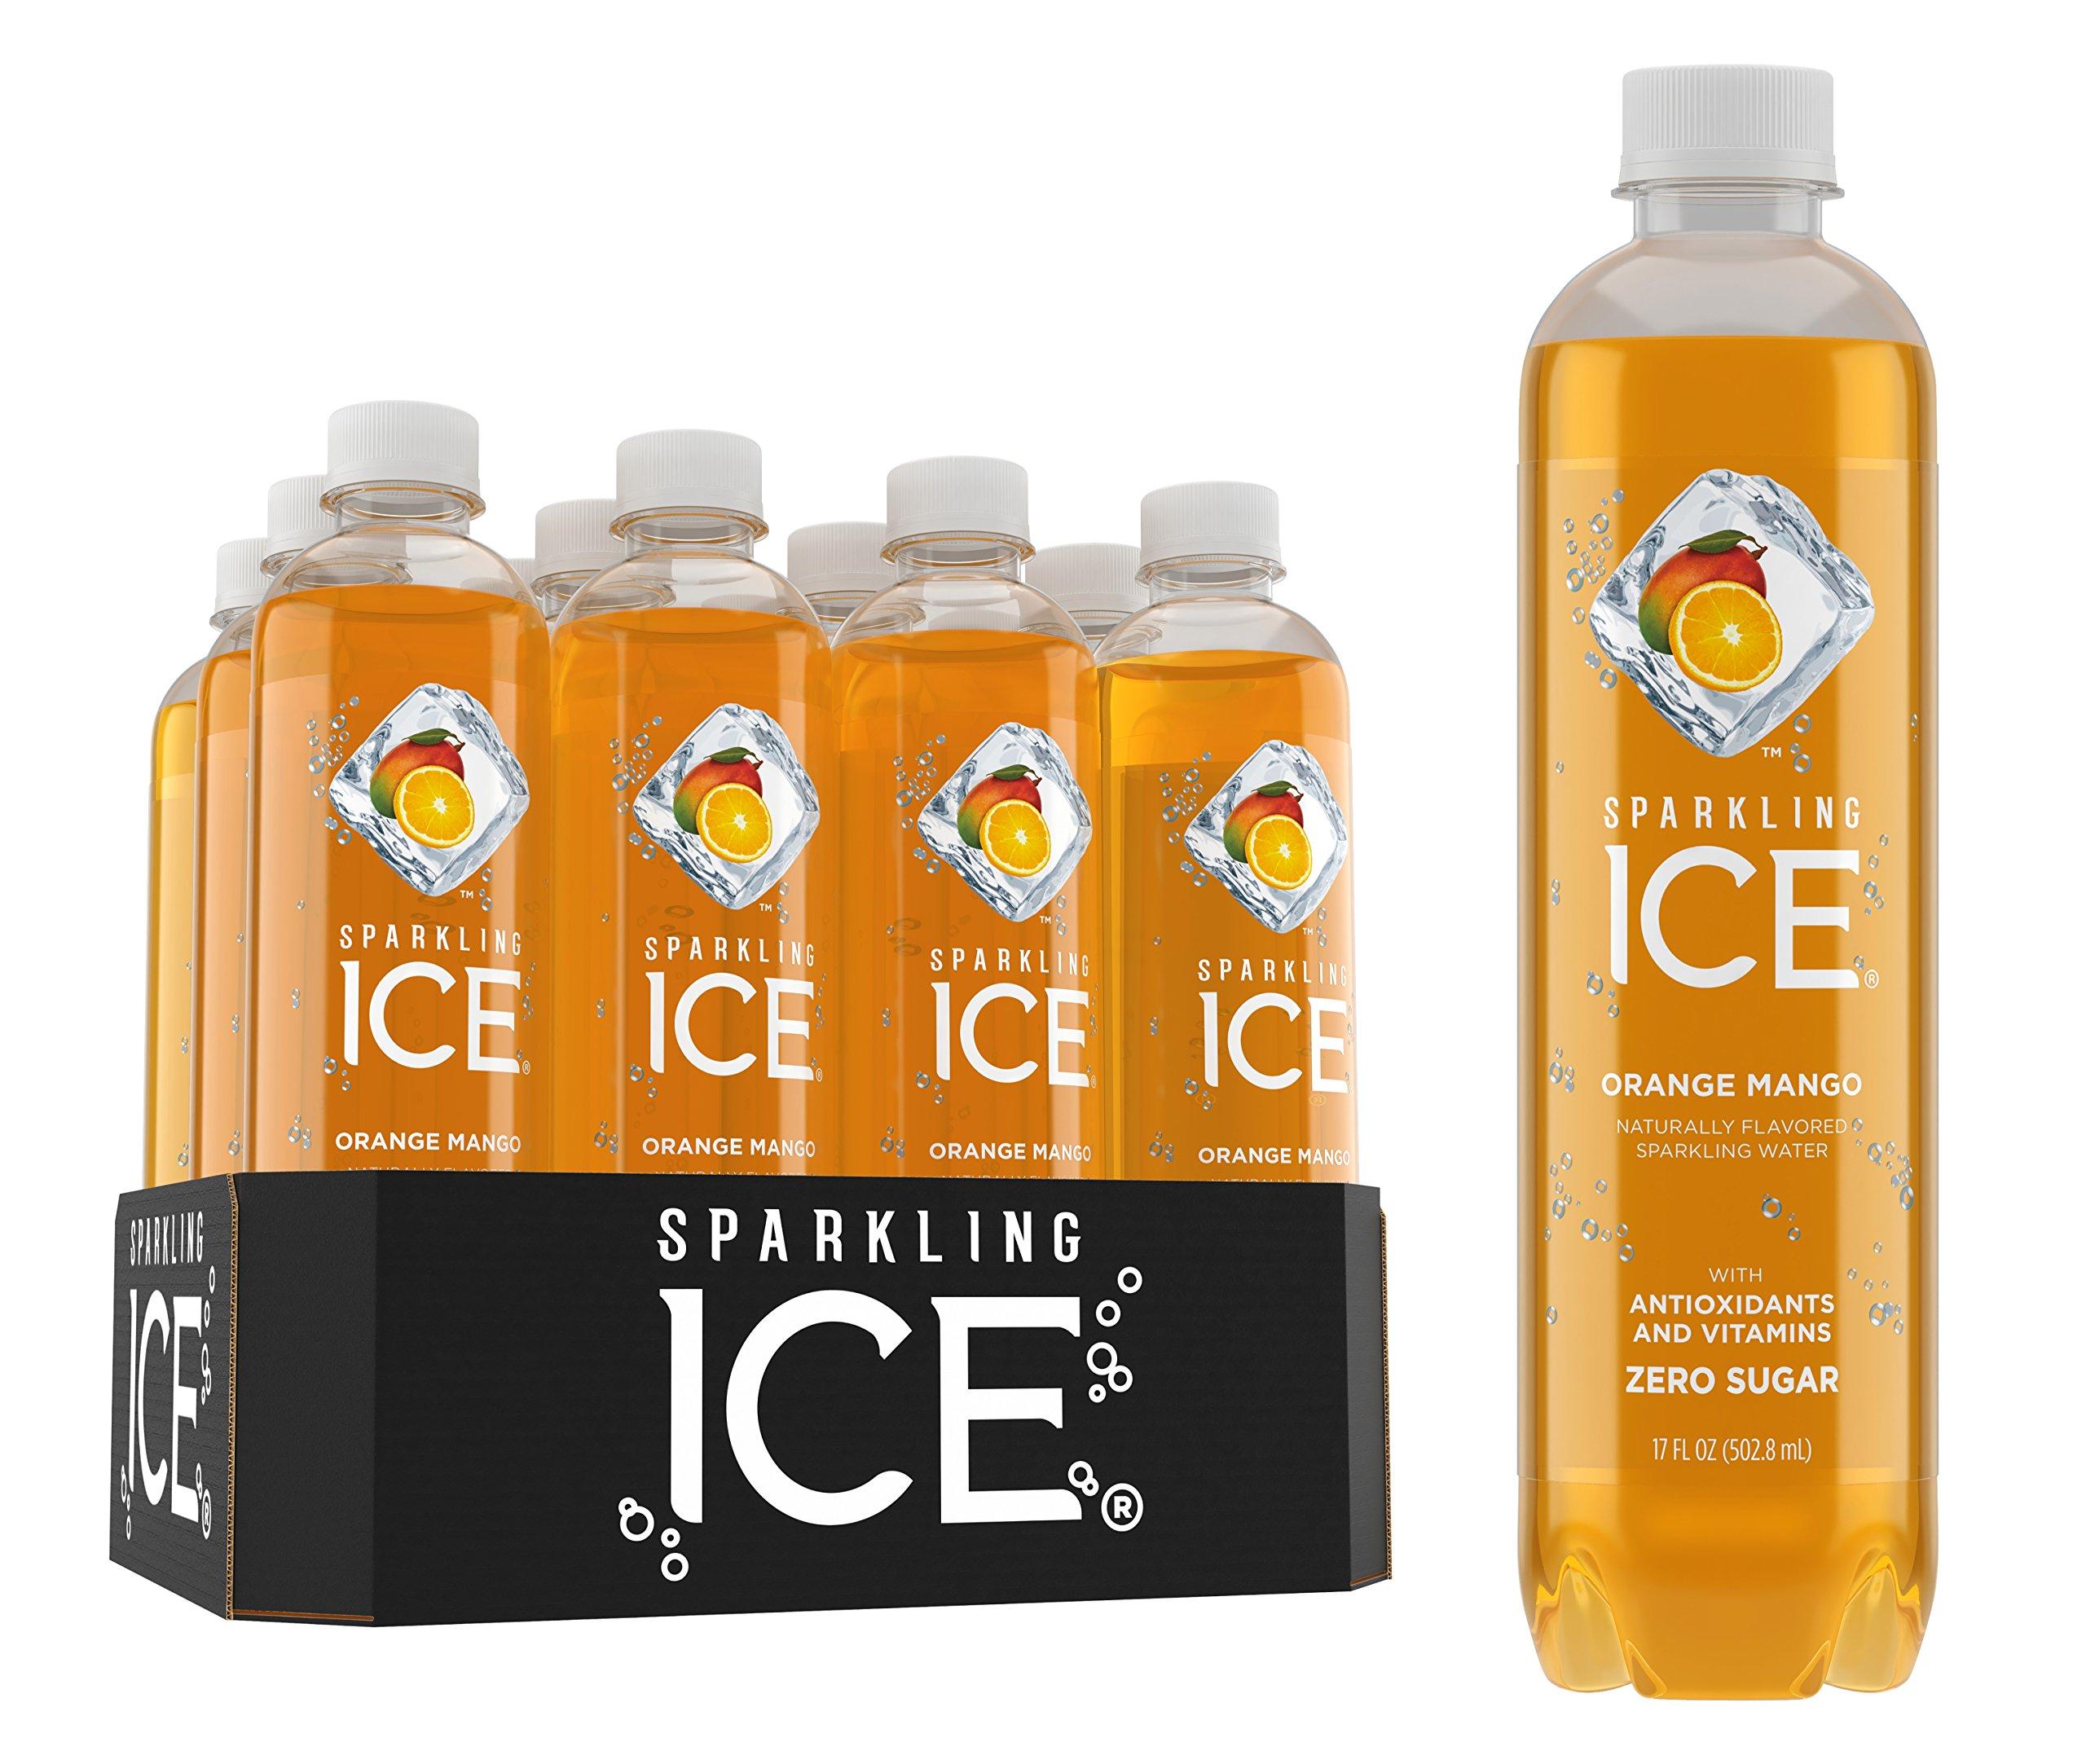 Sparkling Ice Lemon Lime Water With E Juice Liquid Frosty Juiceango Apple Original 100 Not Ejm Orange Mango Antioxidants And Vitamins Zero Sugar 17